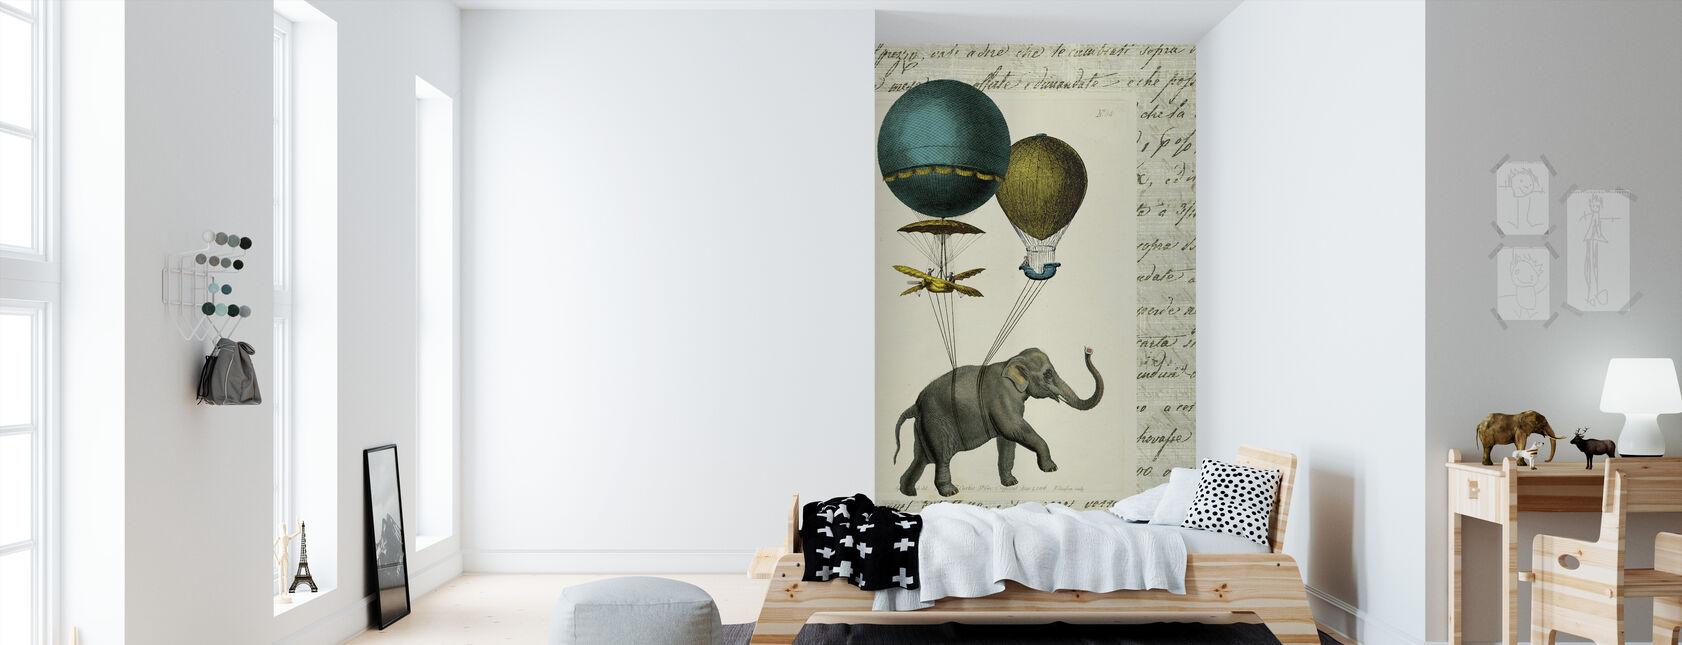 Elephant Ride 2 - Wallpaper - Kids Room